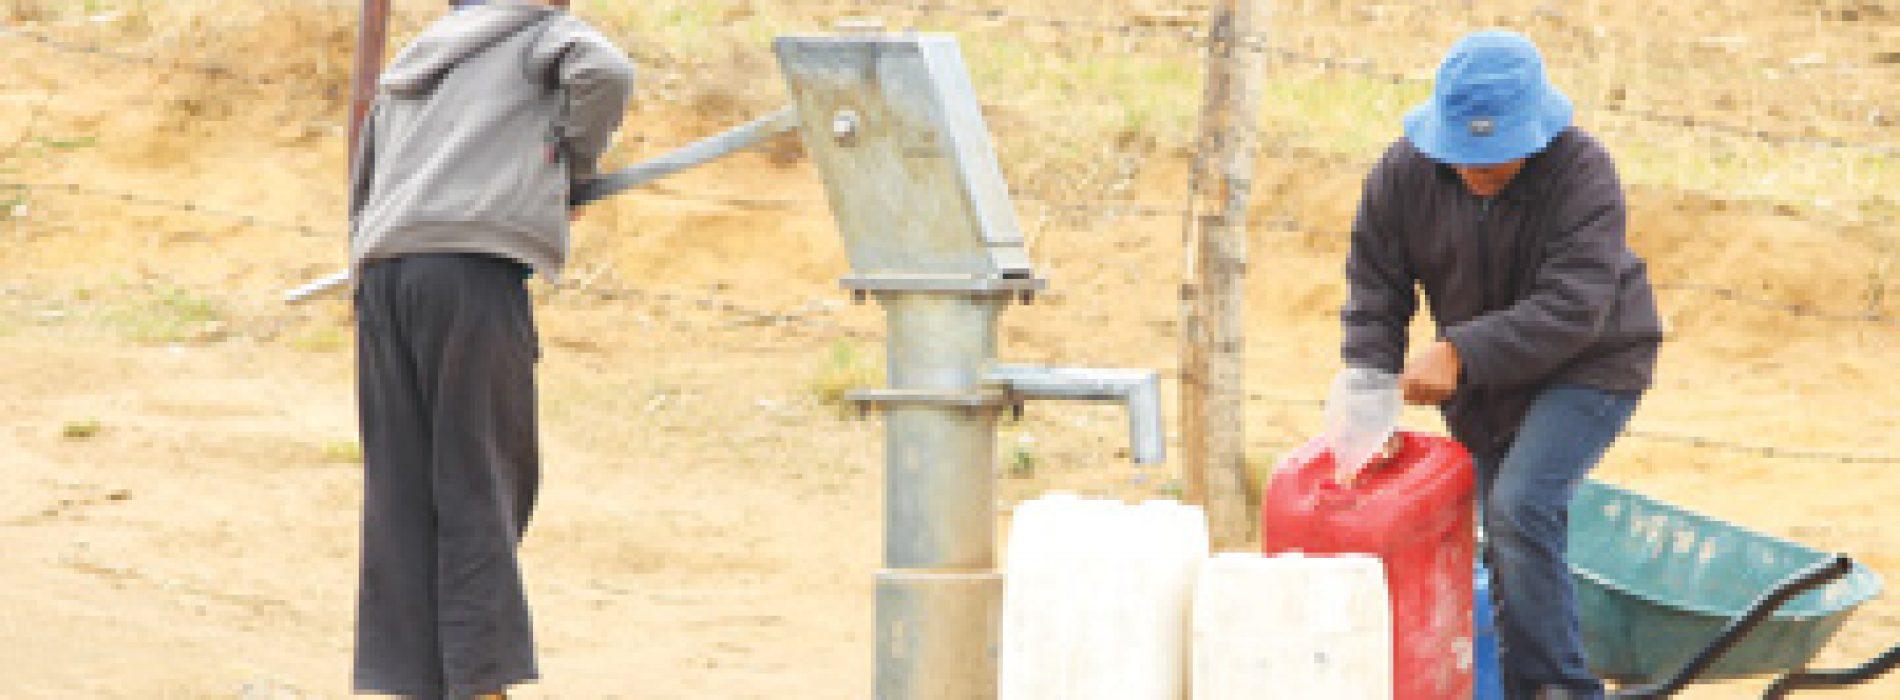 Thirsty in a land of plenty